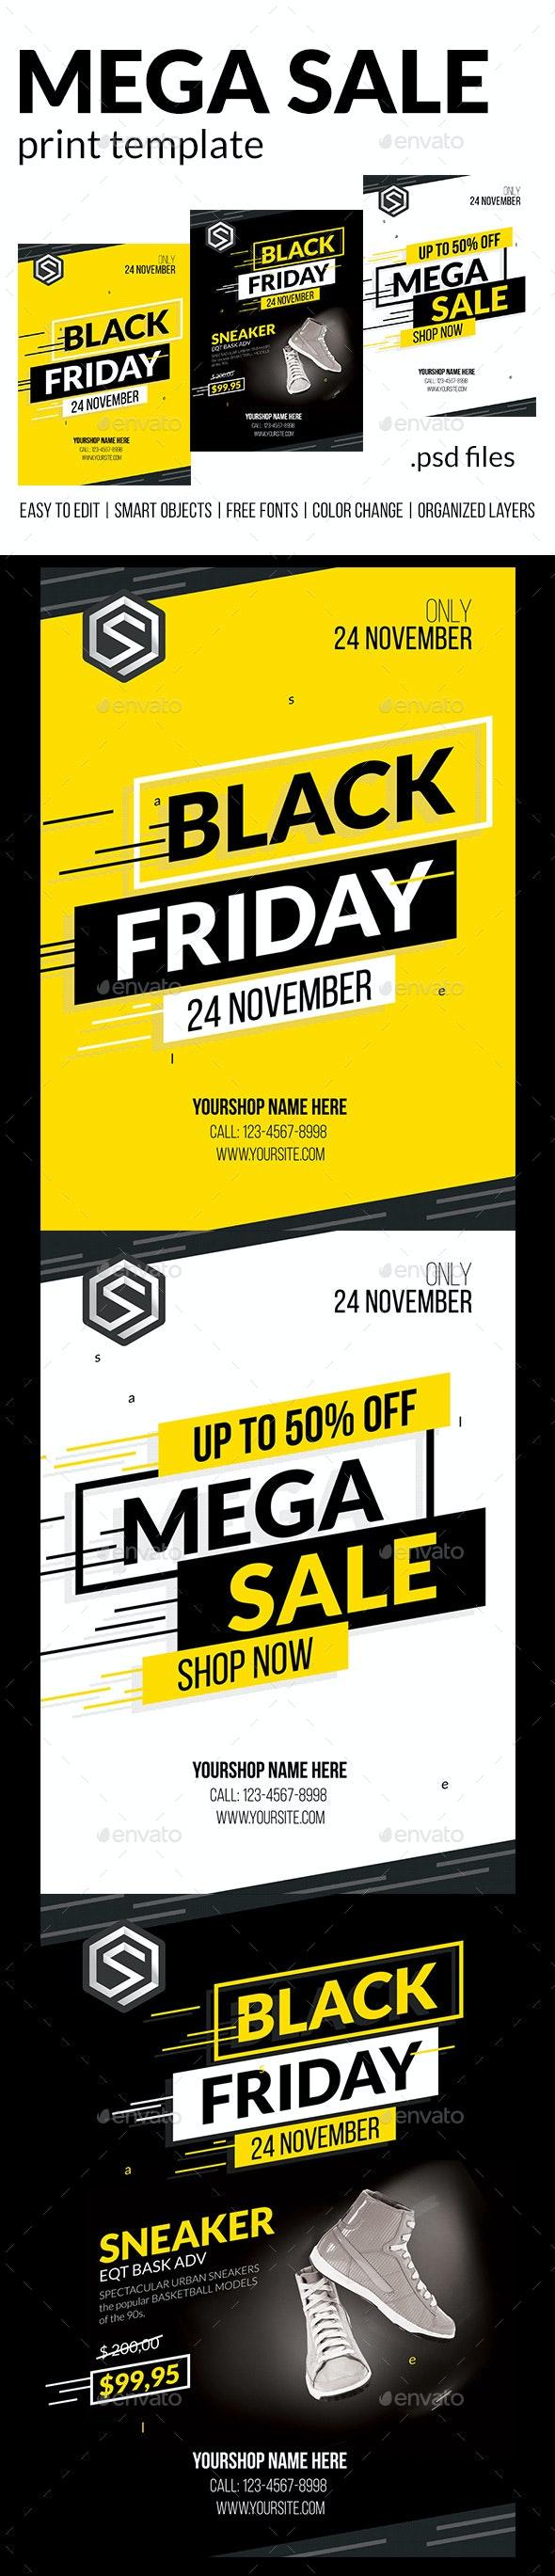 Mega Sale - Commerce Flyers